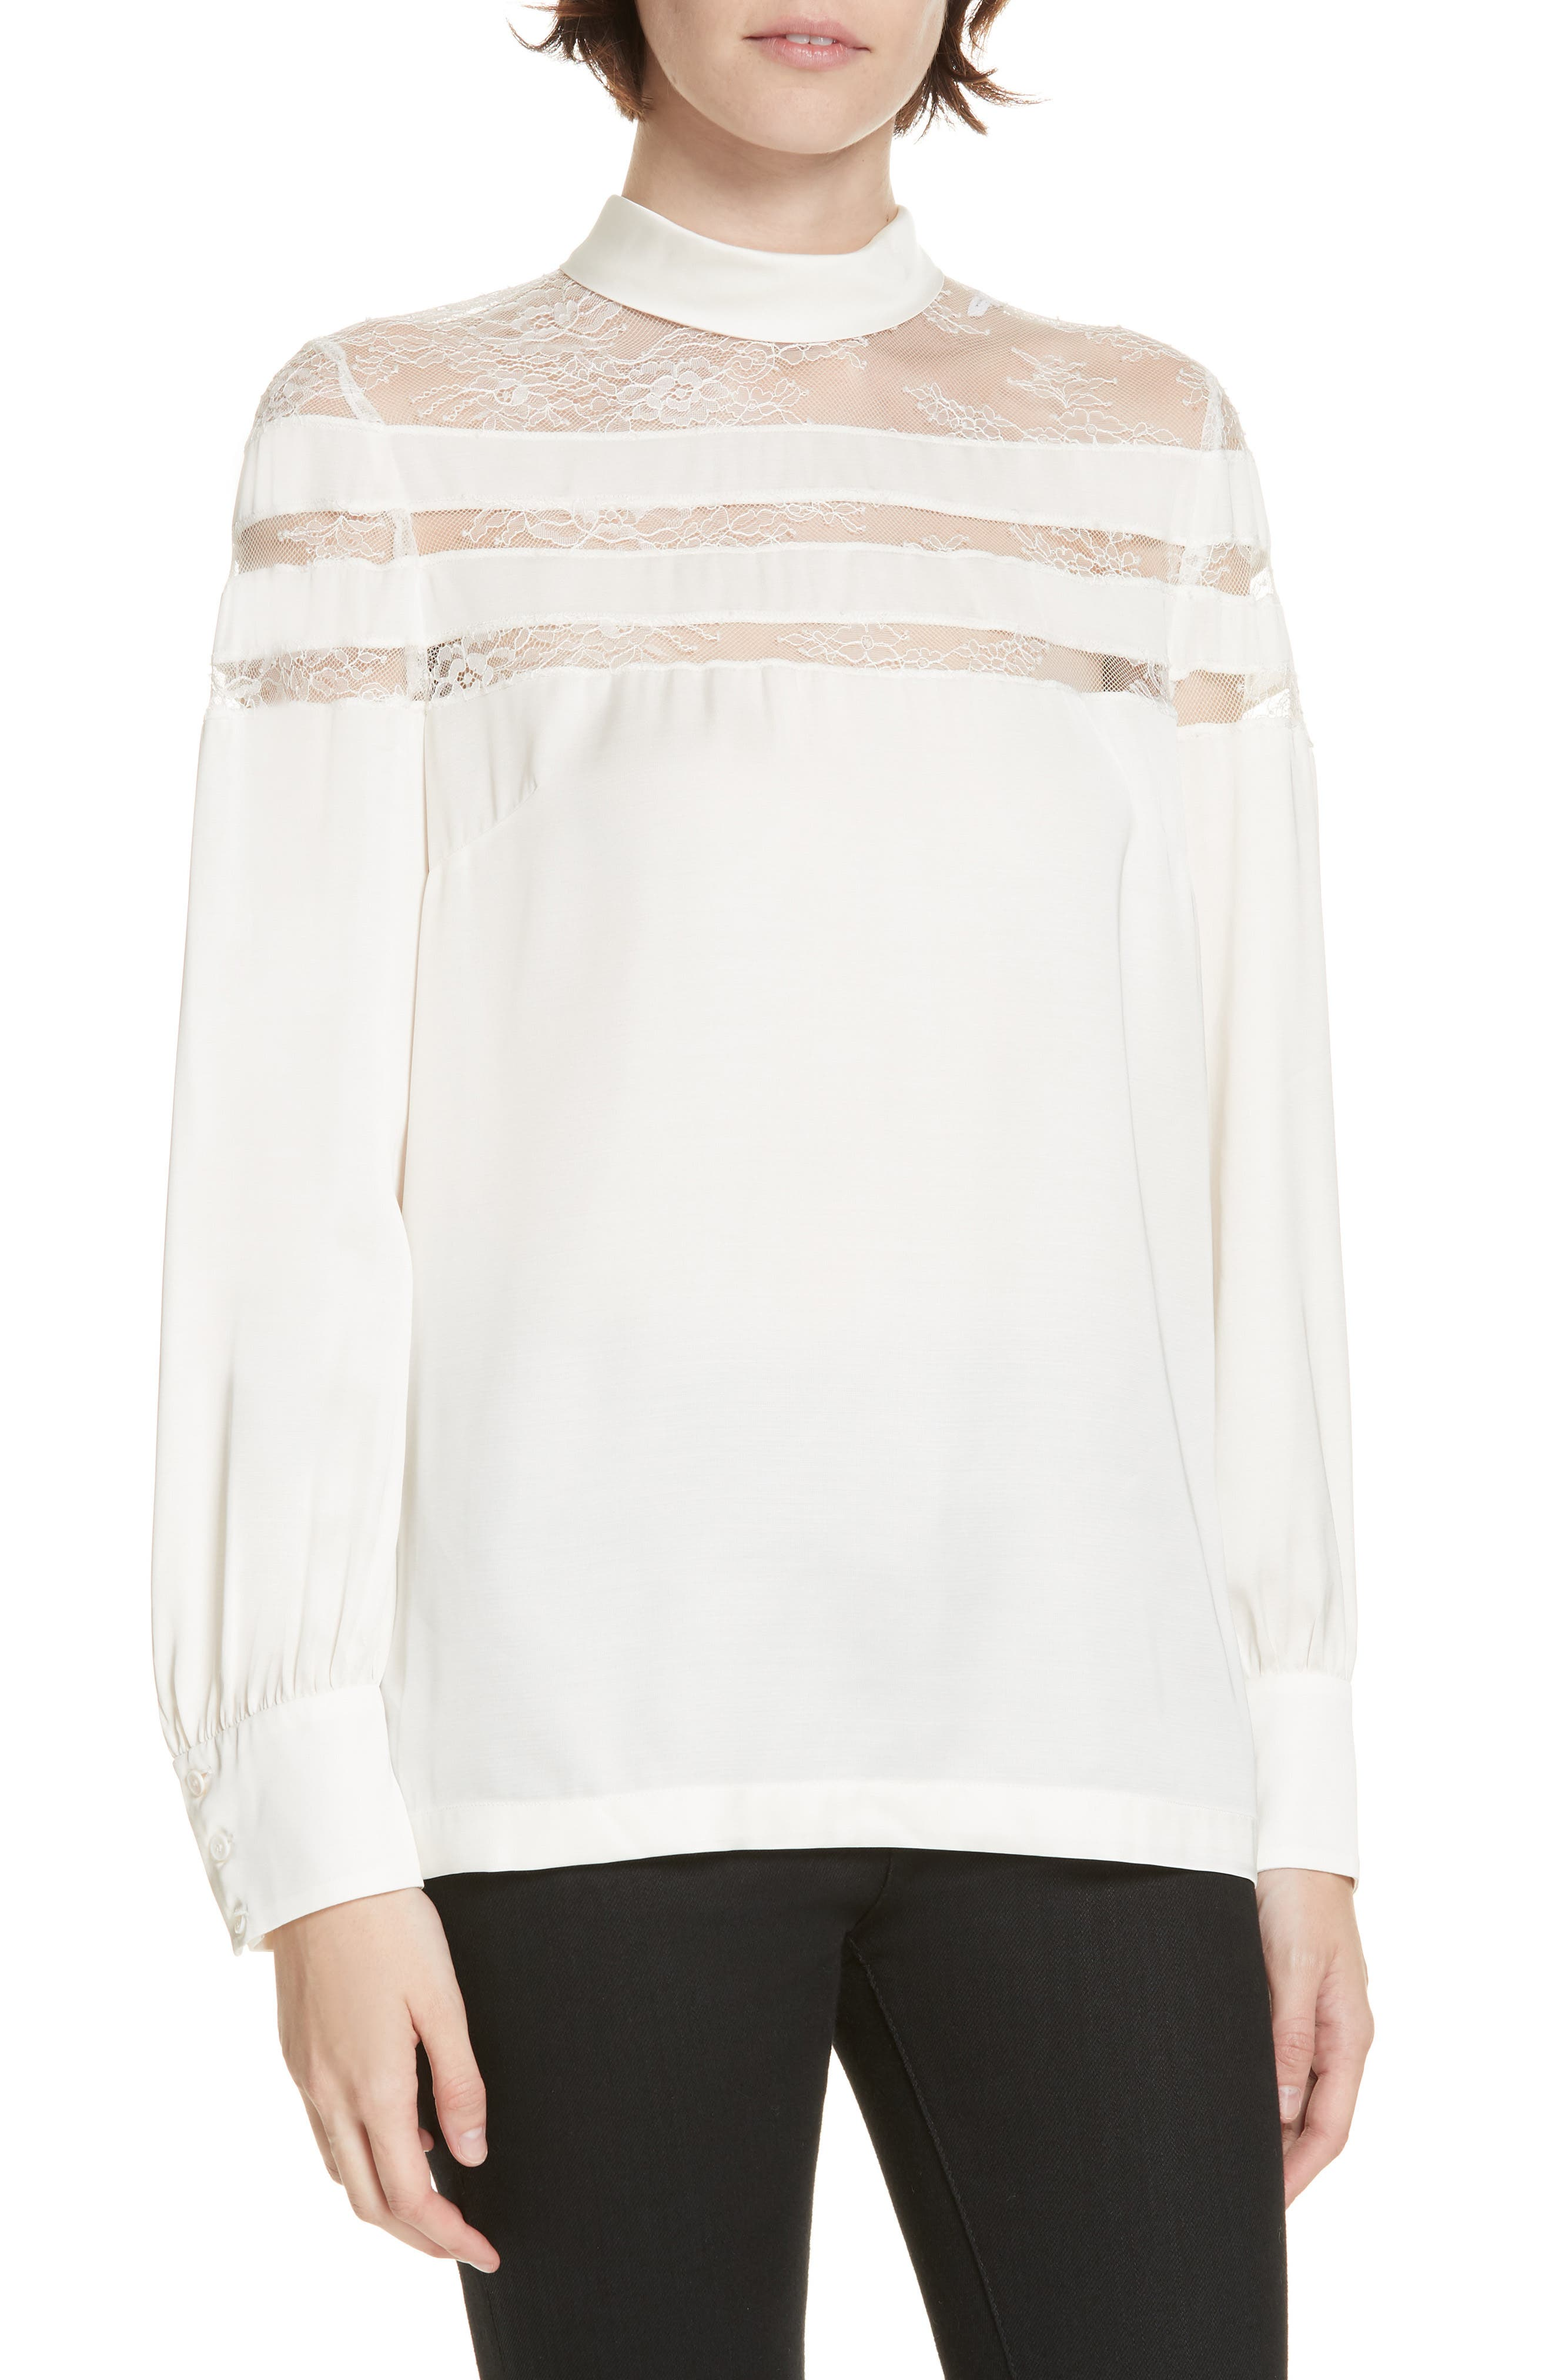 Mirtylles Lace Detail Sheer Top,                         Main,                         color, 101